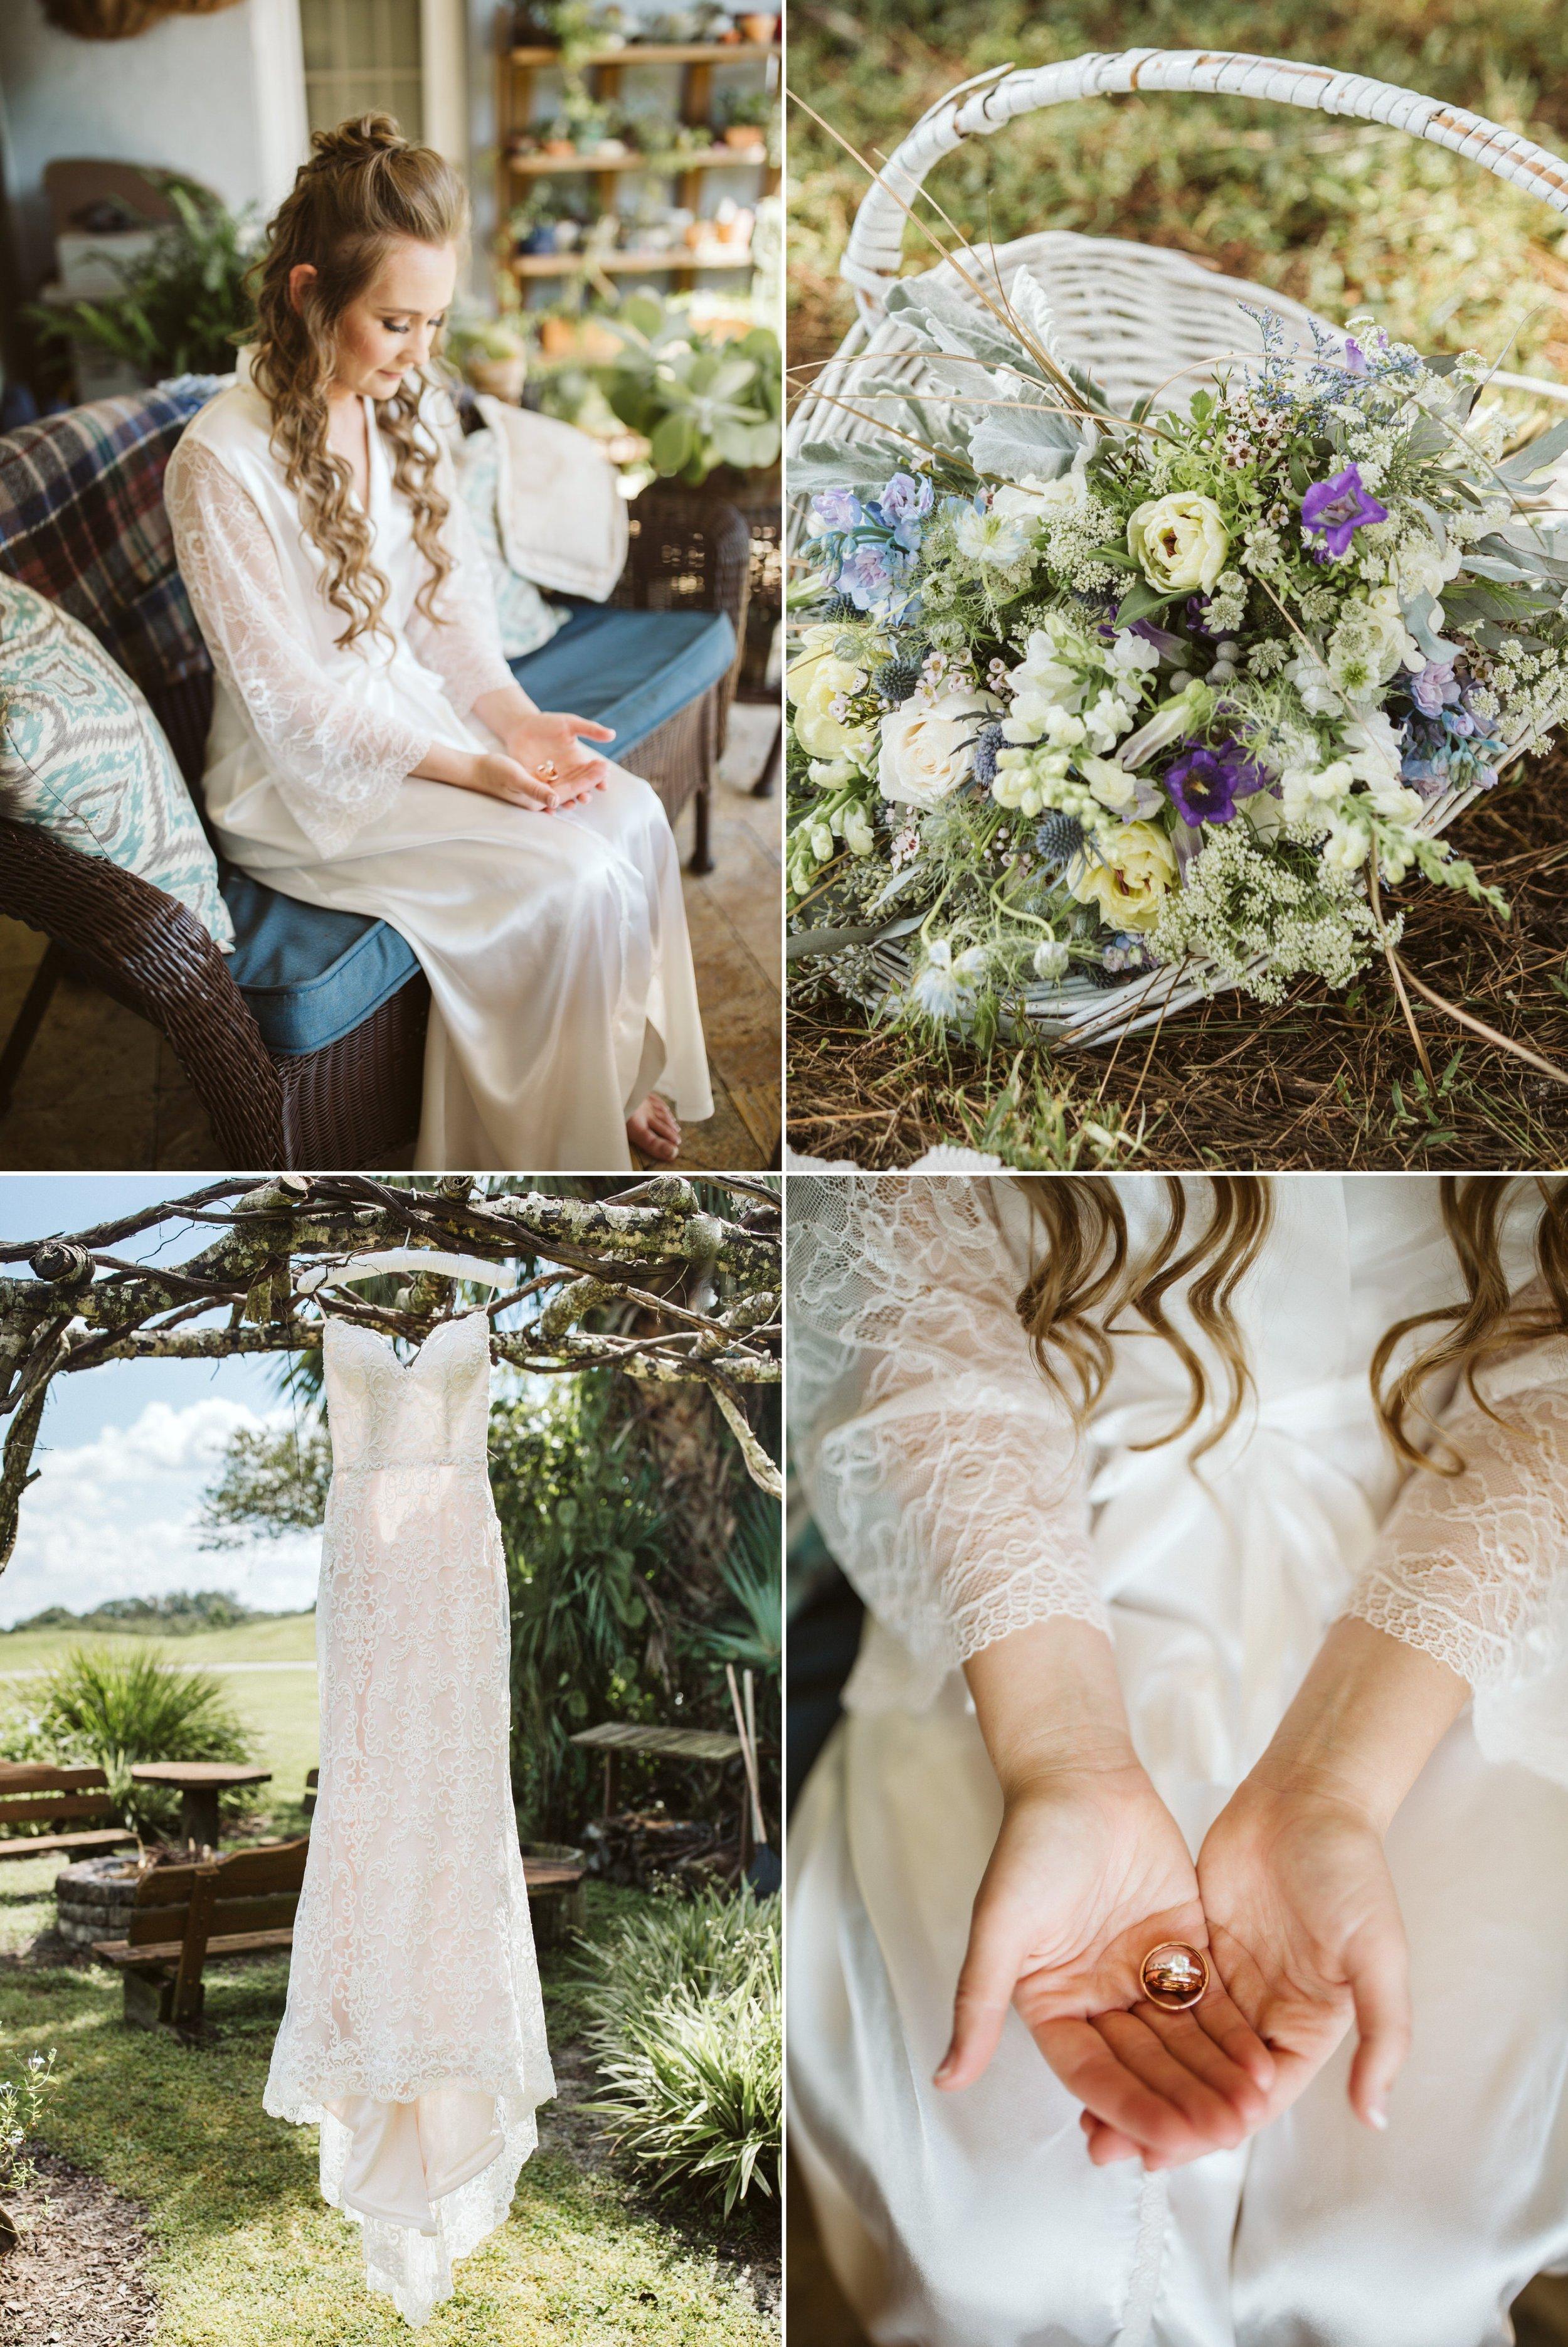 Romantic Floral Outdoor Field Chapel Wedding- Sarasota Florida- Courtney & Isaac3.jpg